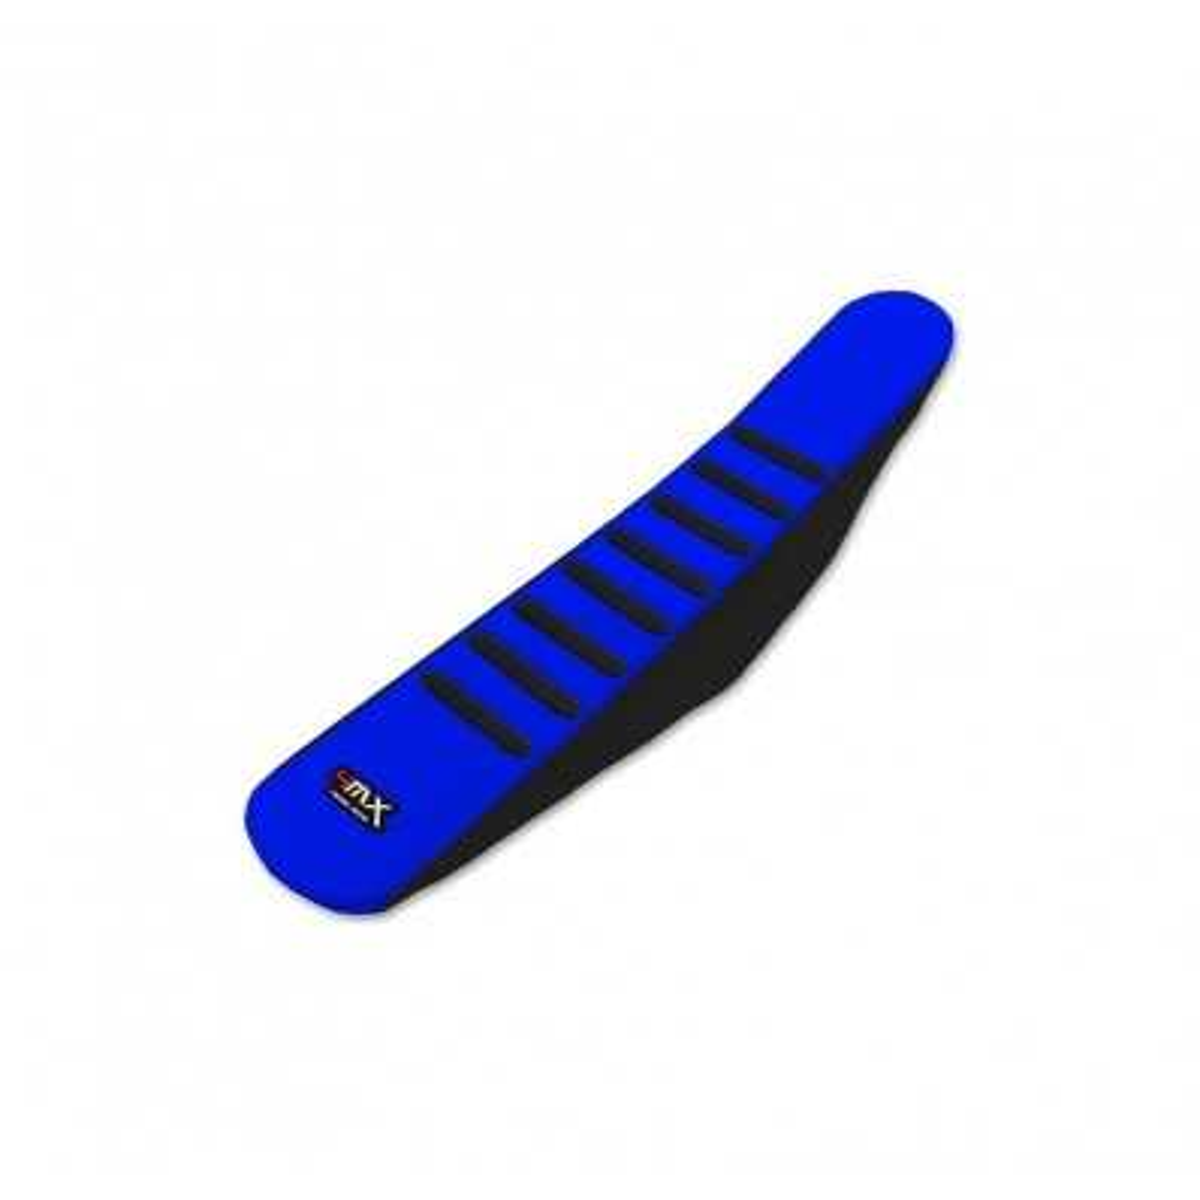 01CAP1021 - Funda Sillon 4Mx Yamaha Yzf 250 450 03 05´ Negro Azul